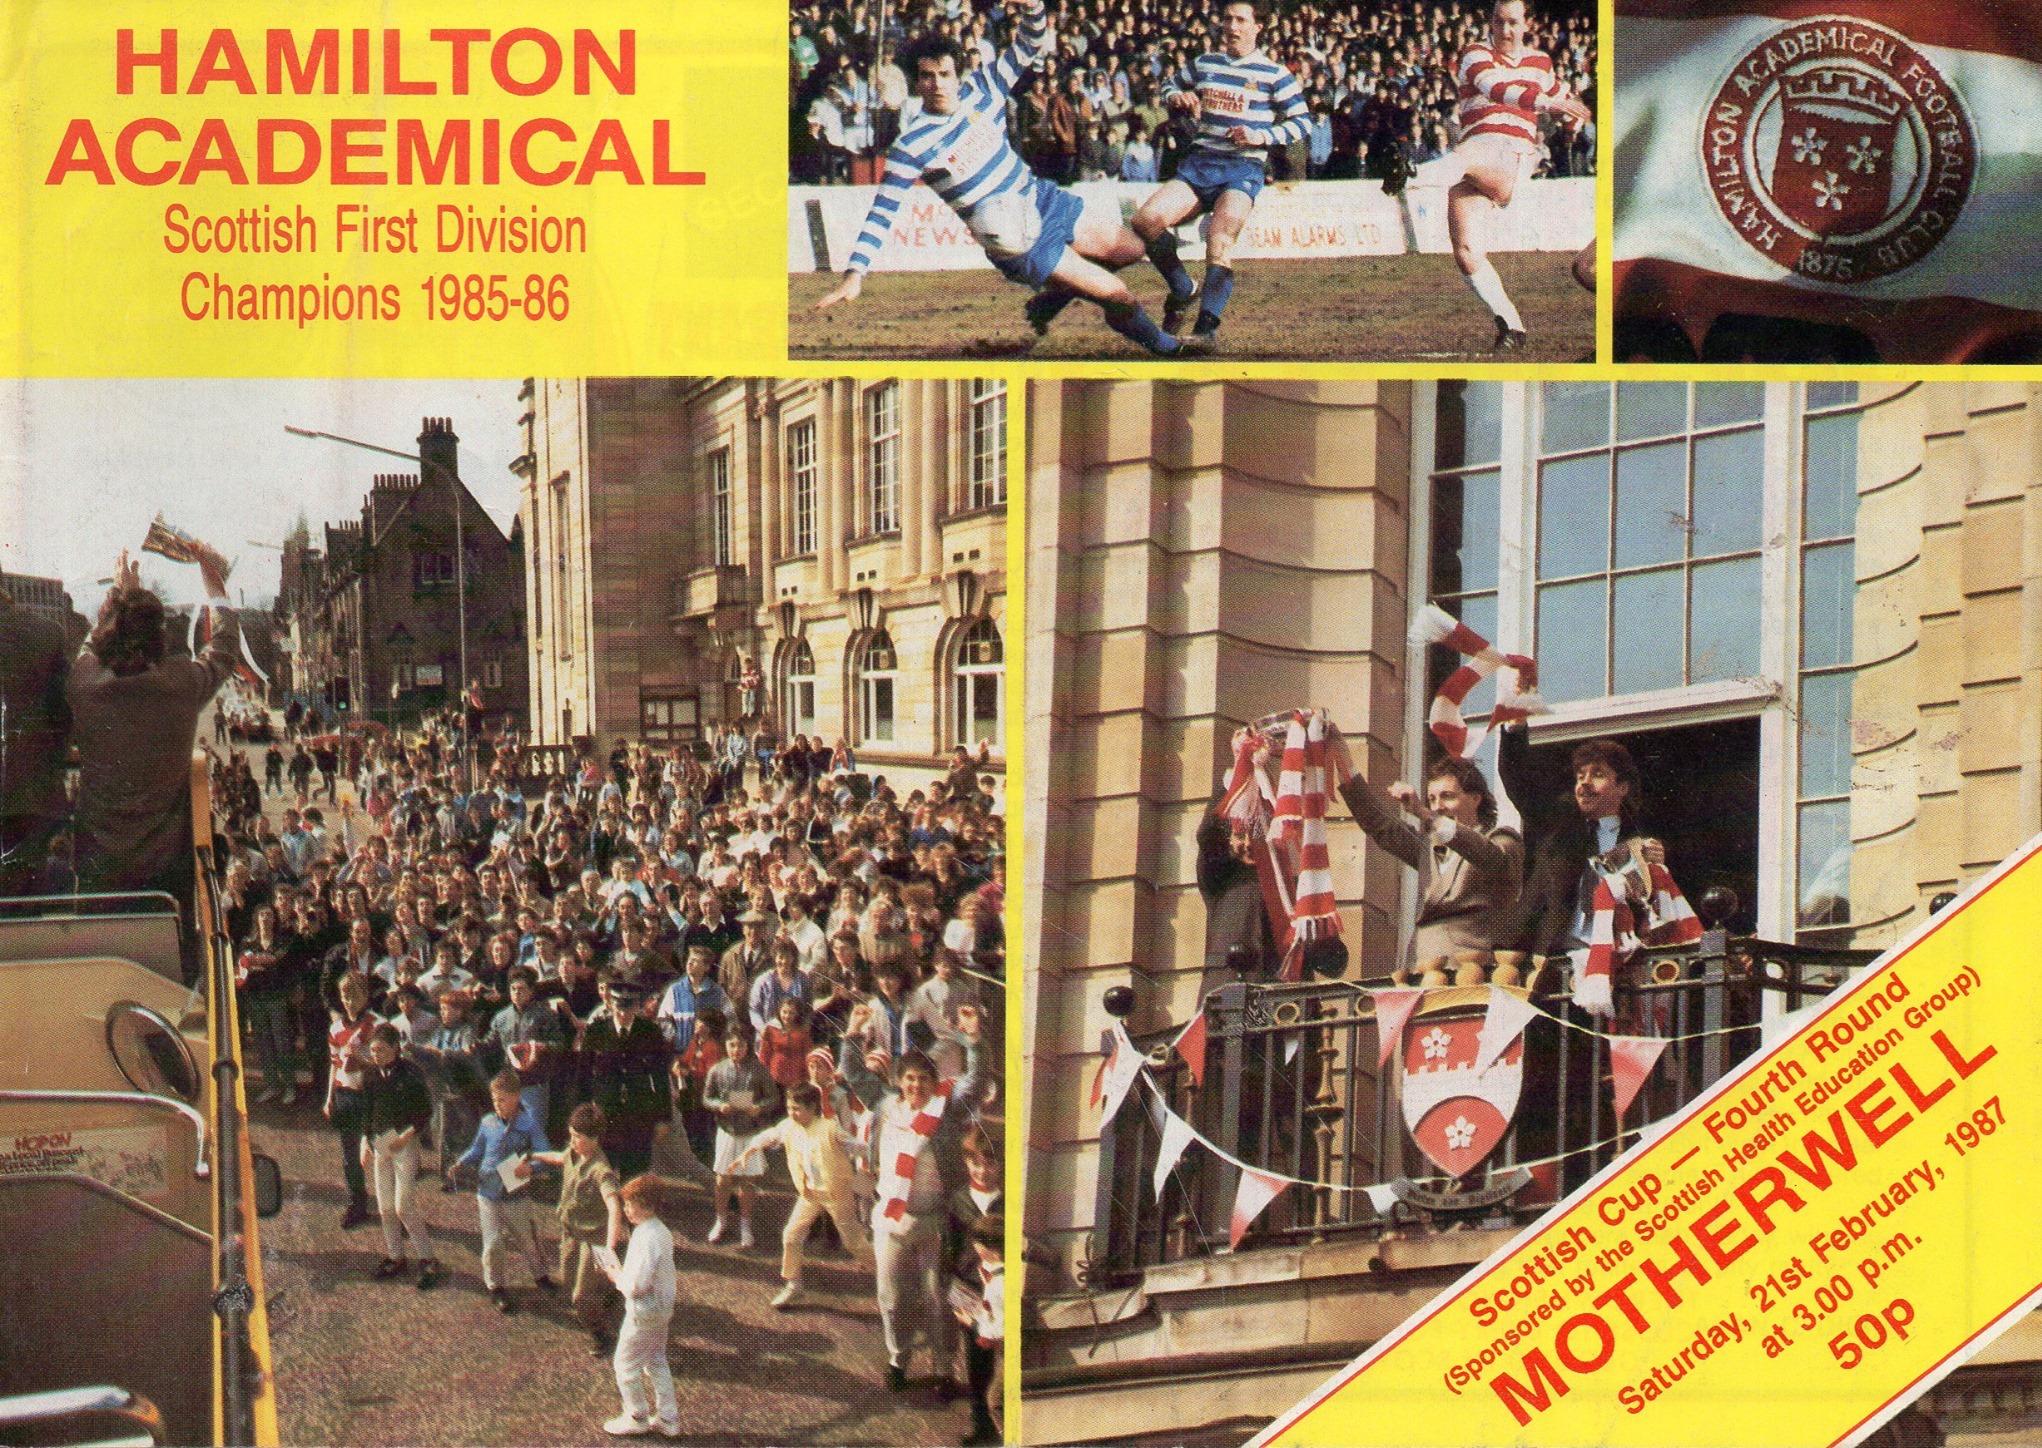 versus Hamilton Programme Cover